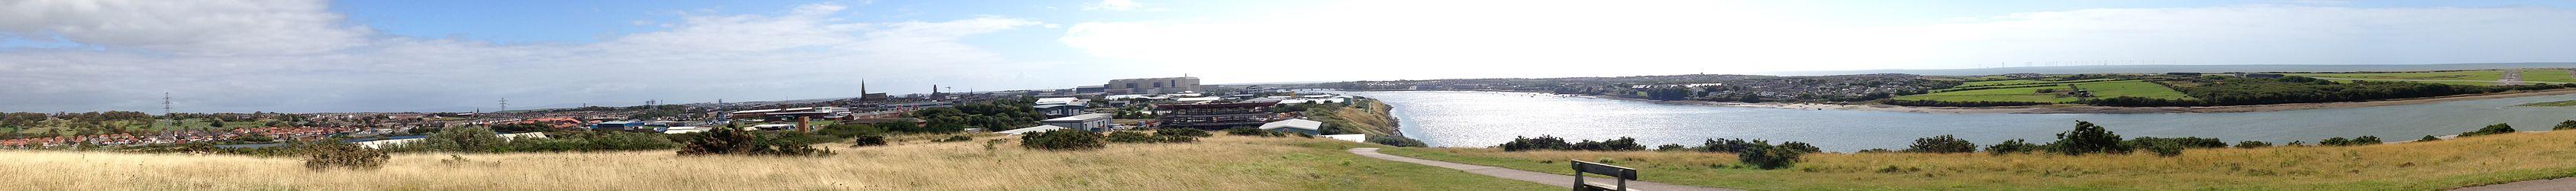 Barrow panorama from slag bank.jpg